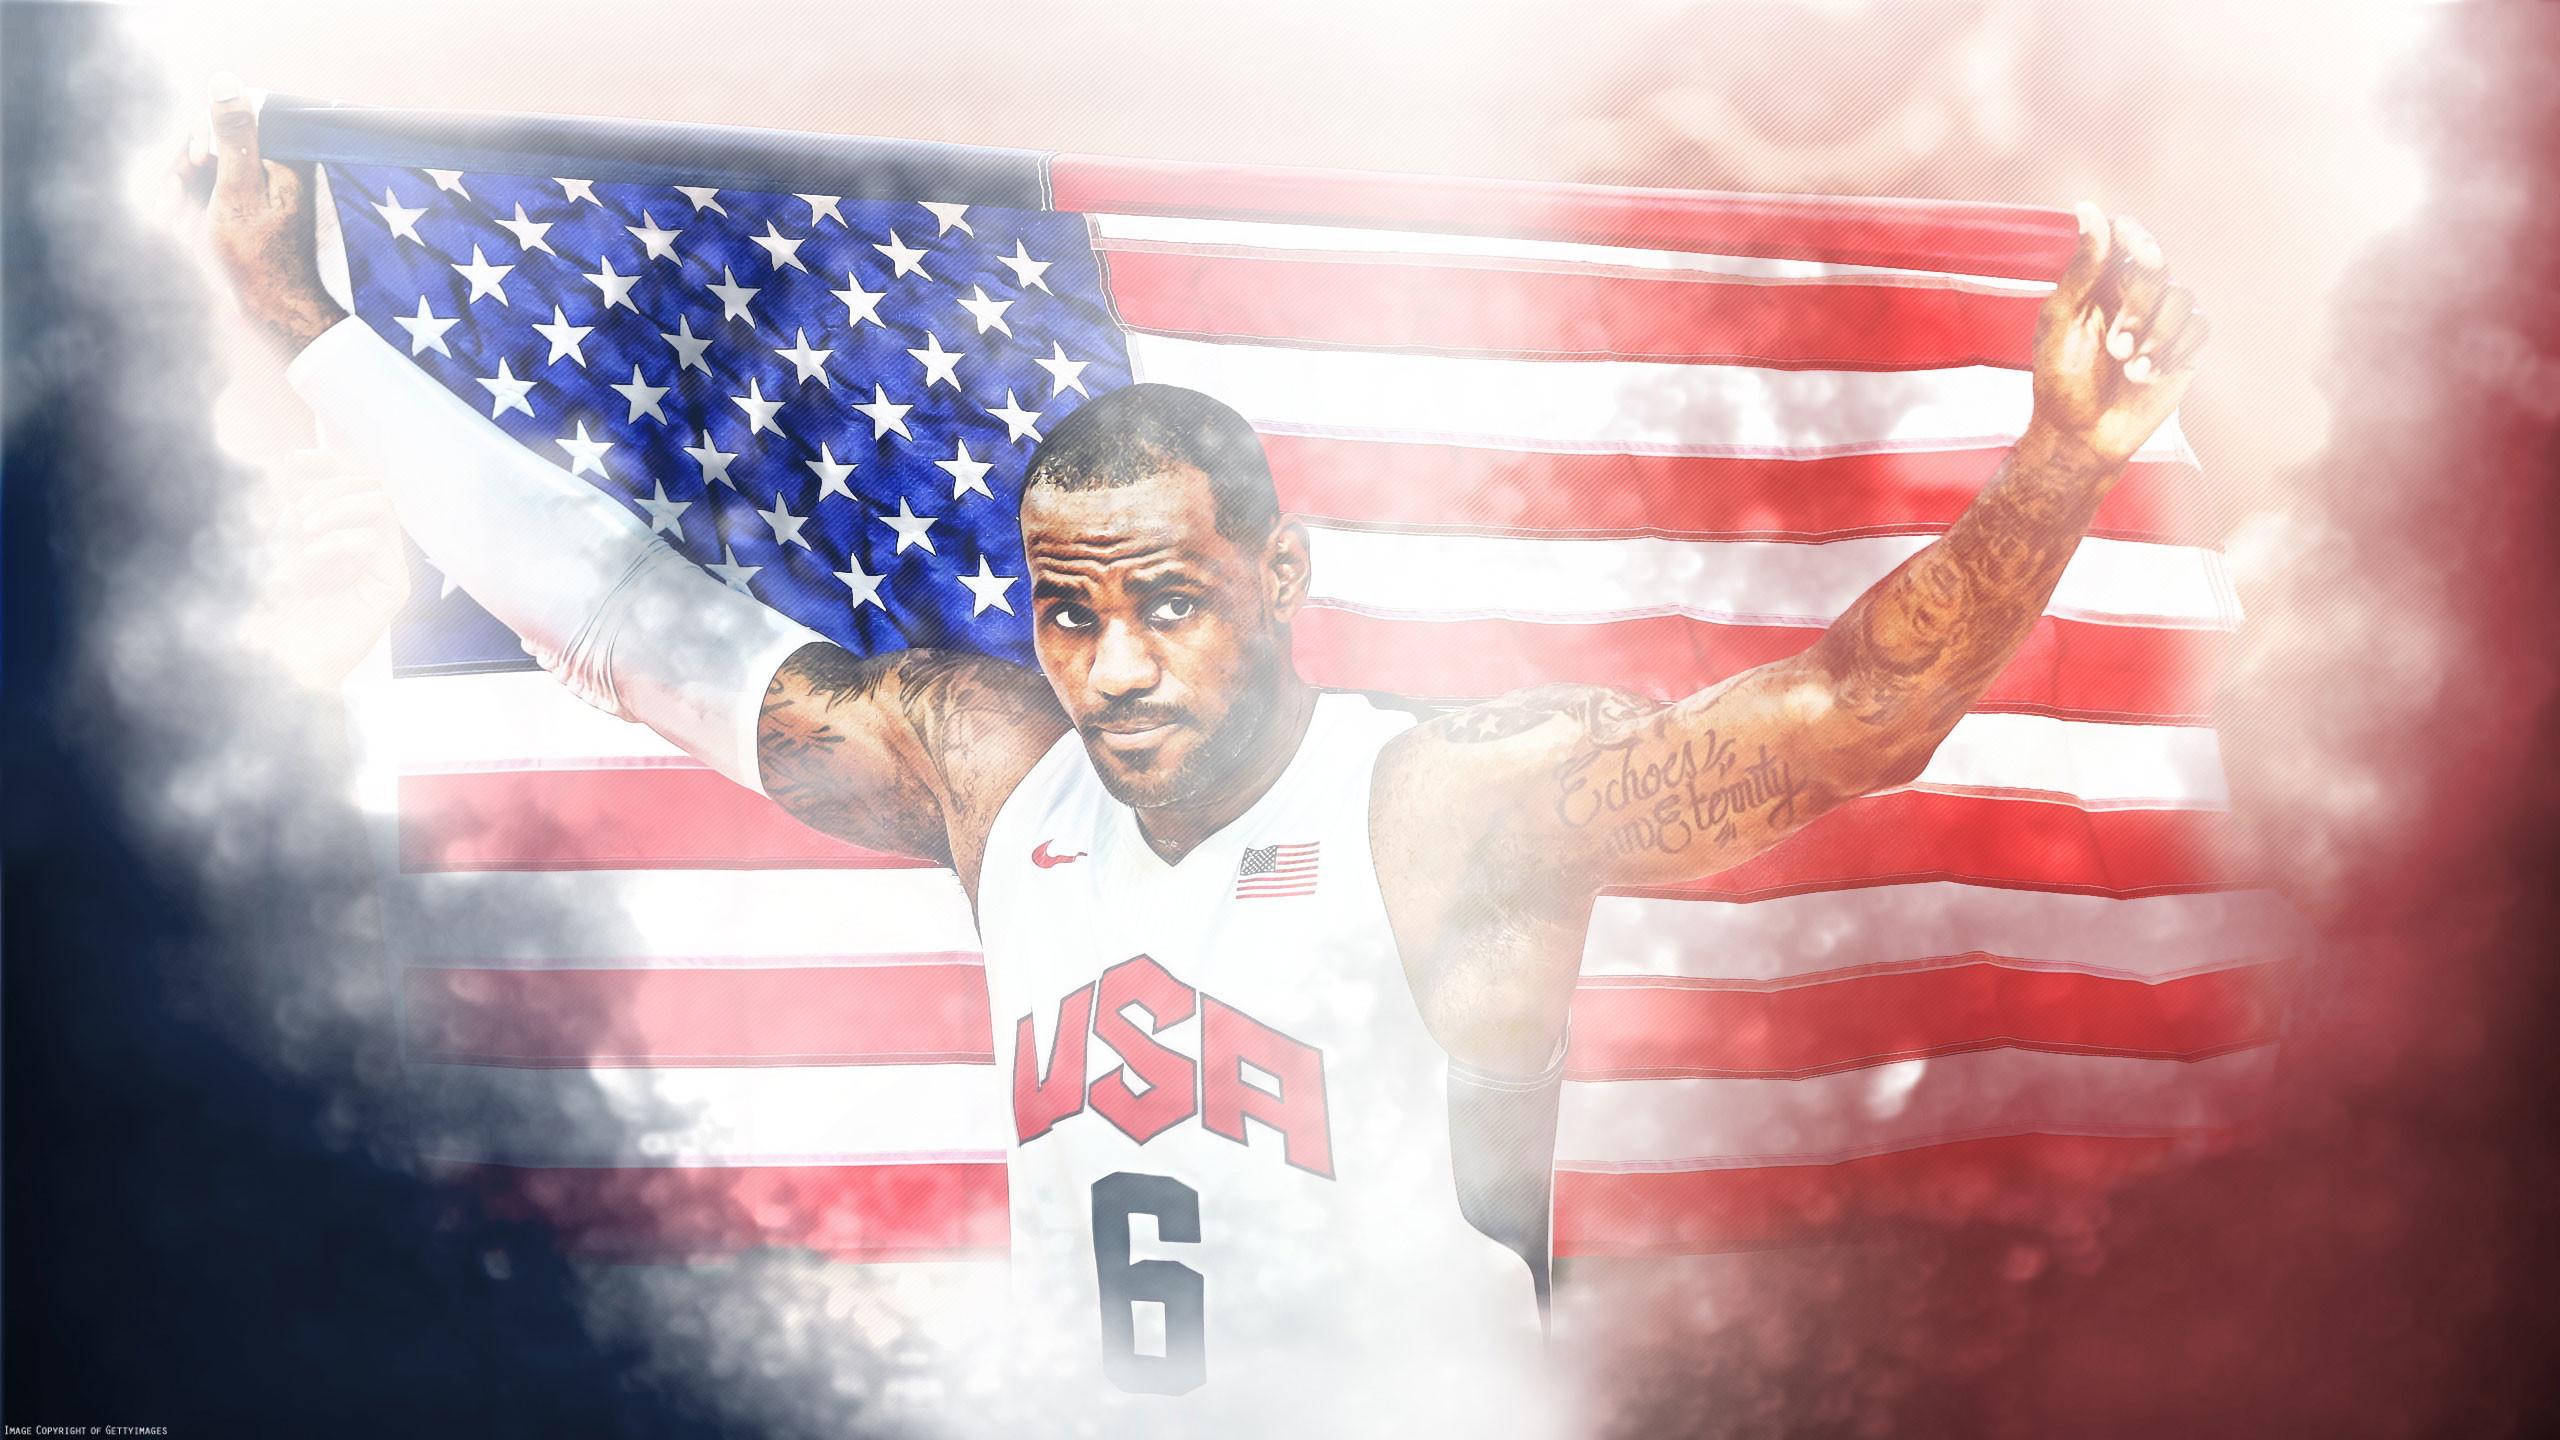 LeBron James NBA Wallpaper American Flag 2012 London Olympics | Official  Website of BBallOne.com